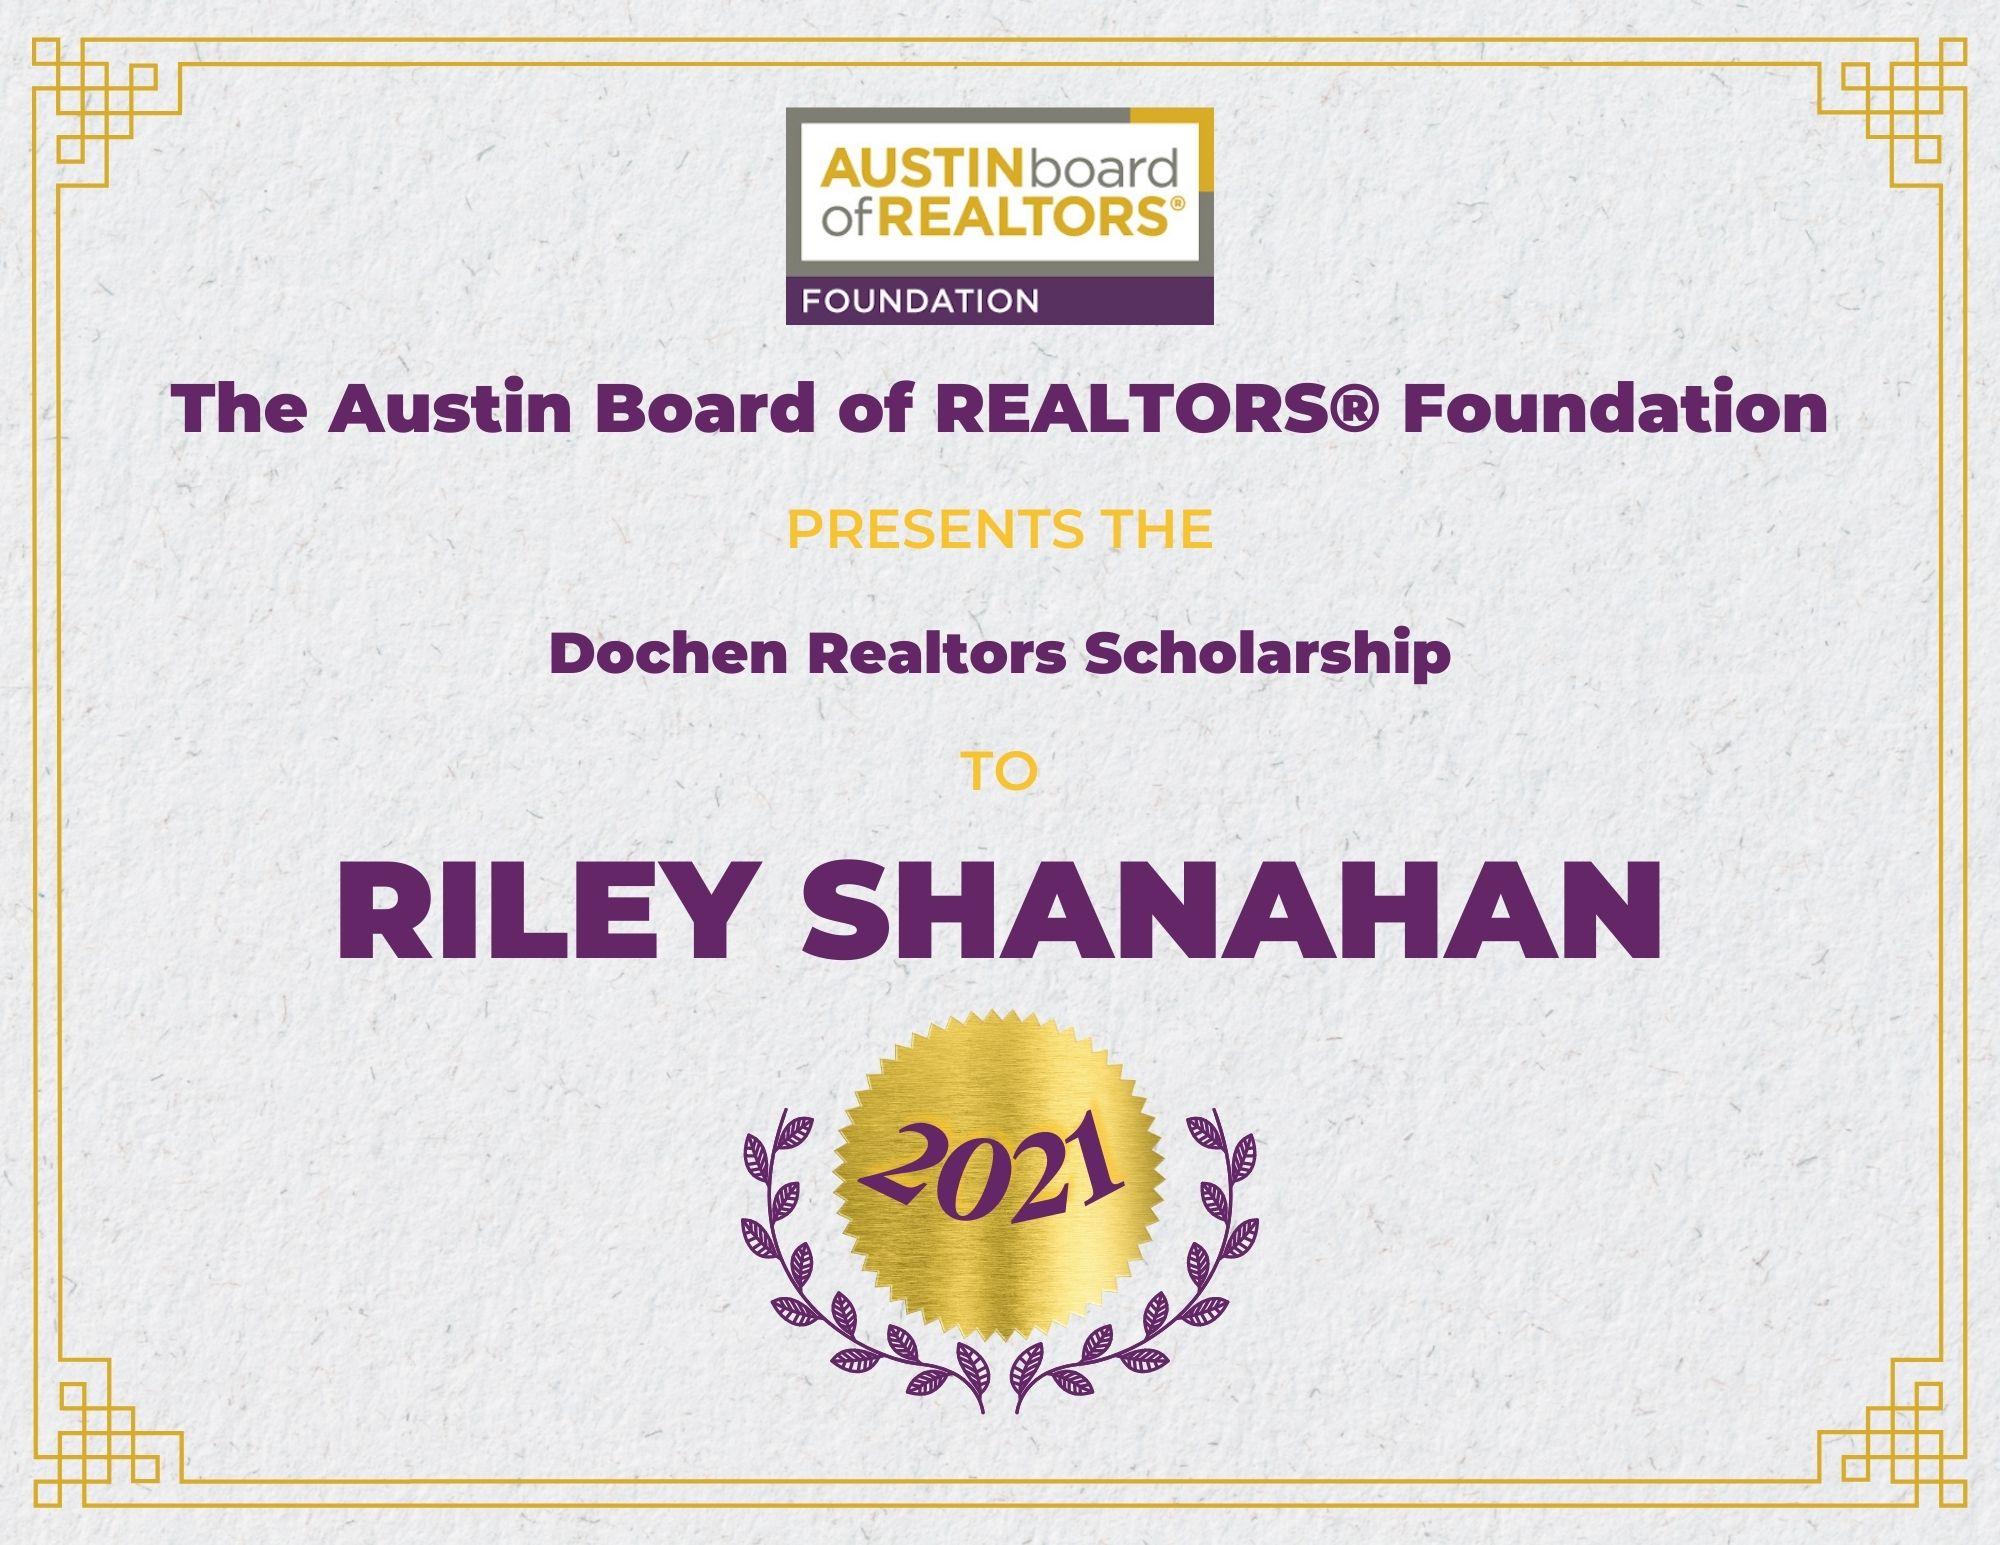 2021 Fou Scholarship Certificate Rileyshanahan